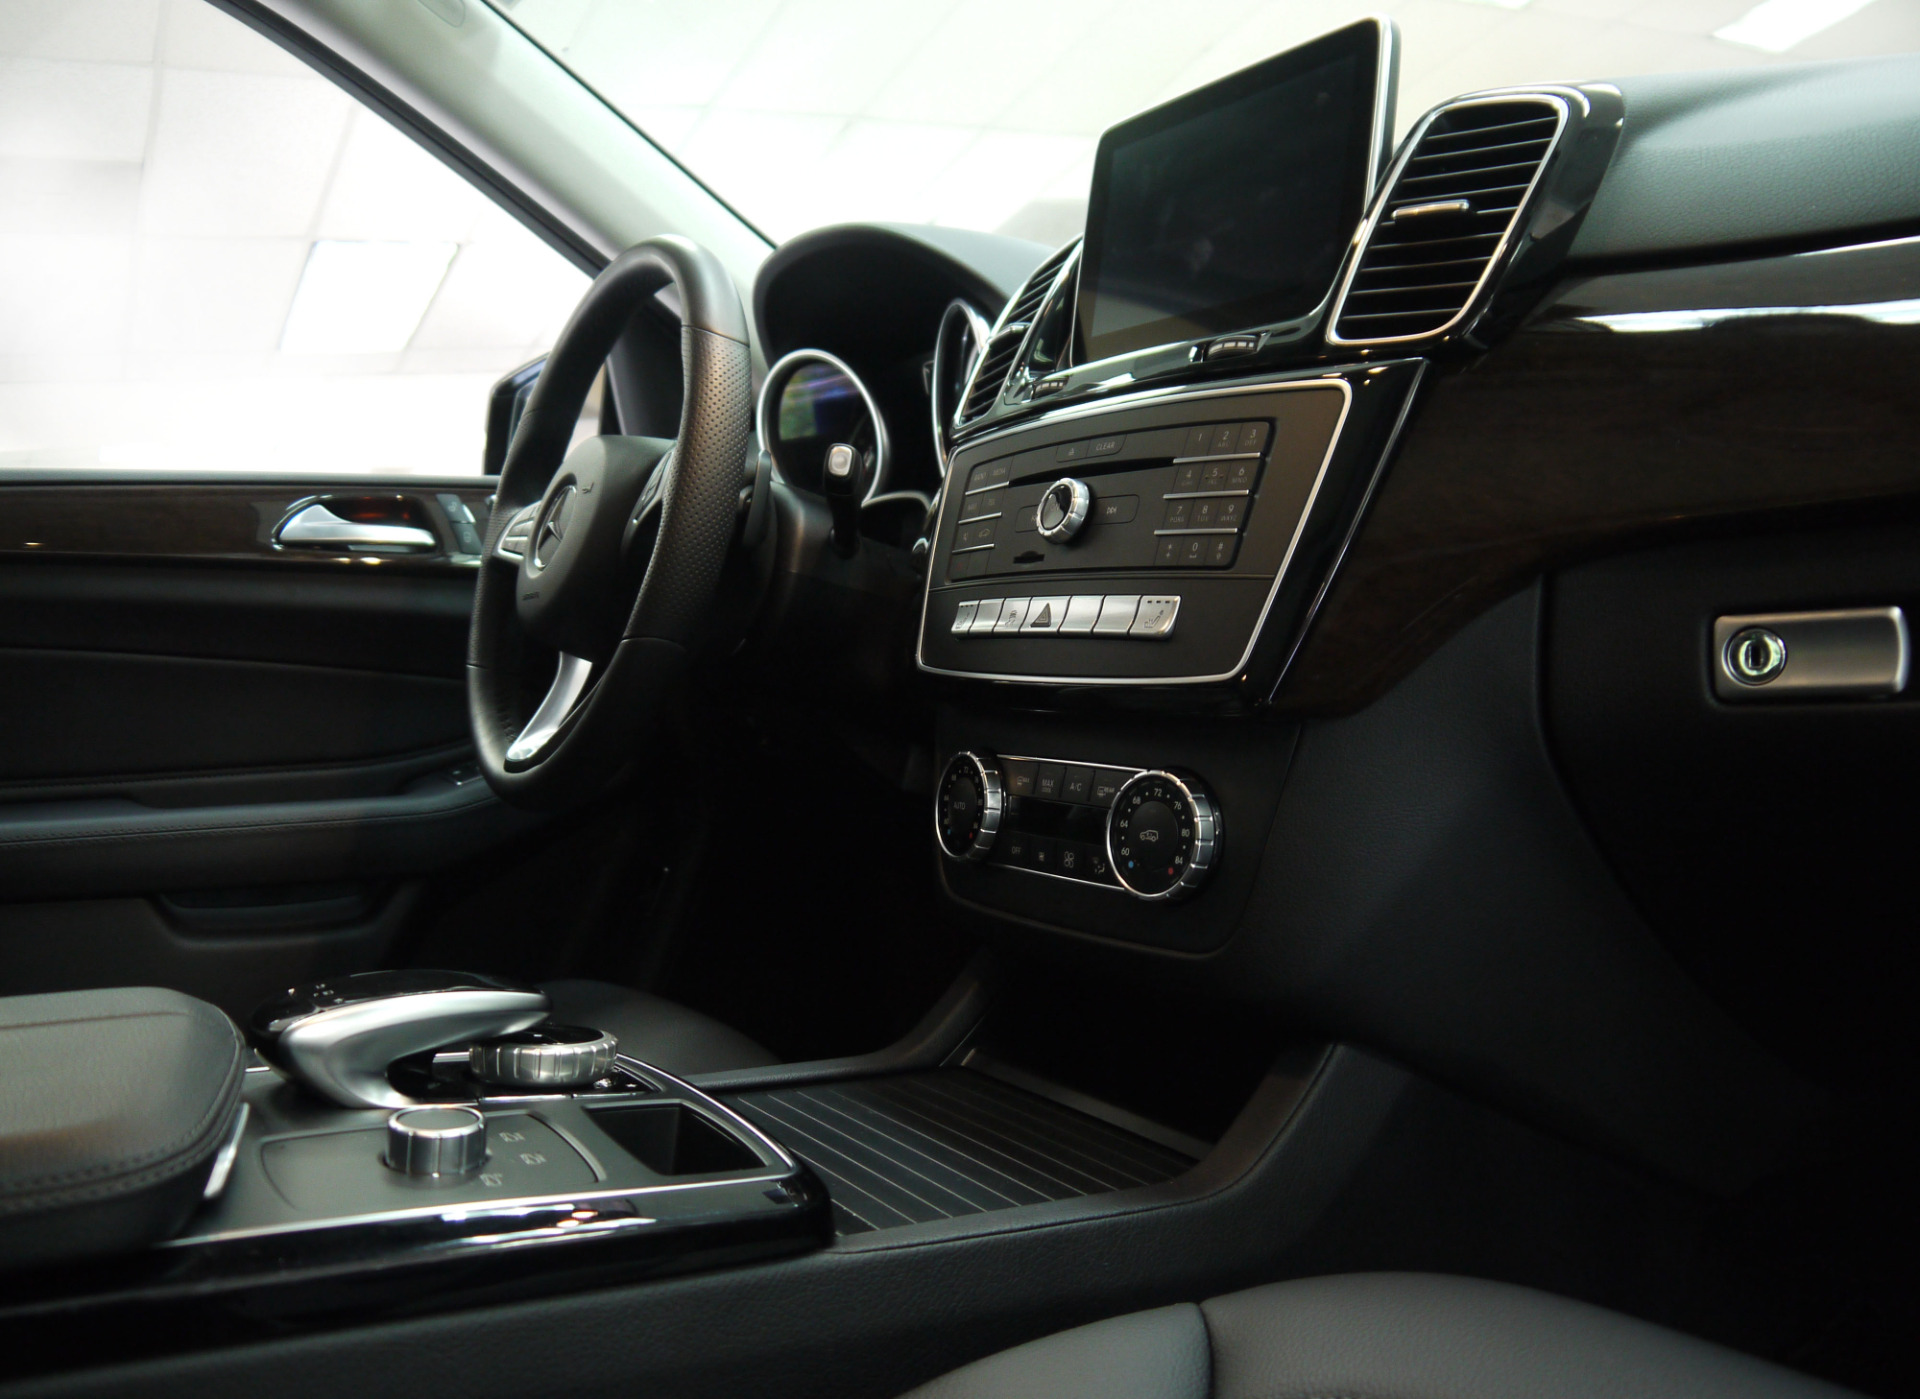 2016 Mercedes Benz Gle Head Gasket: Used 2016 Mercedes-Benz GLE 350